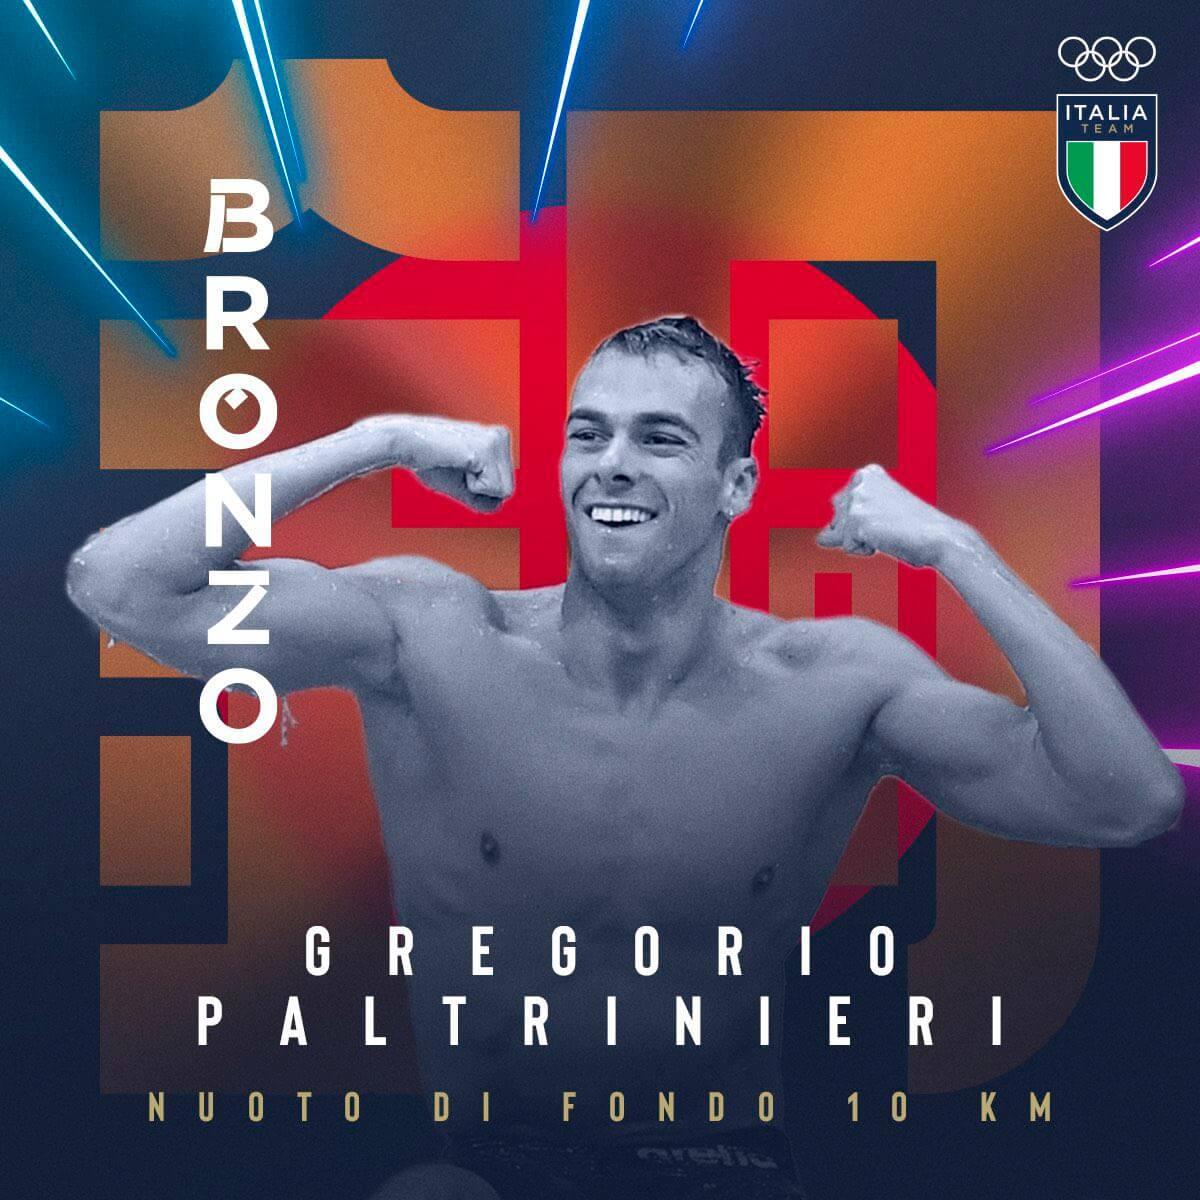 gregorio paltrinieri olimpiadi